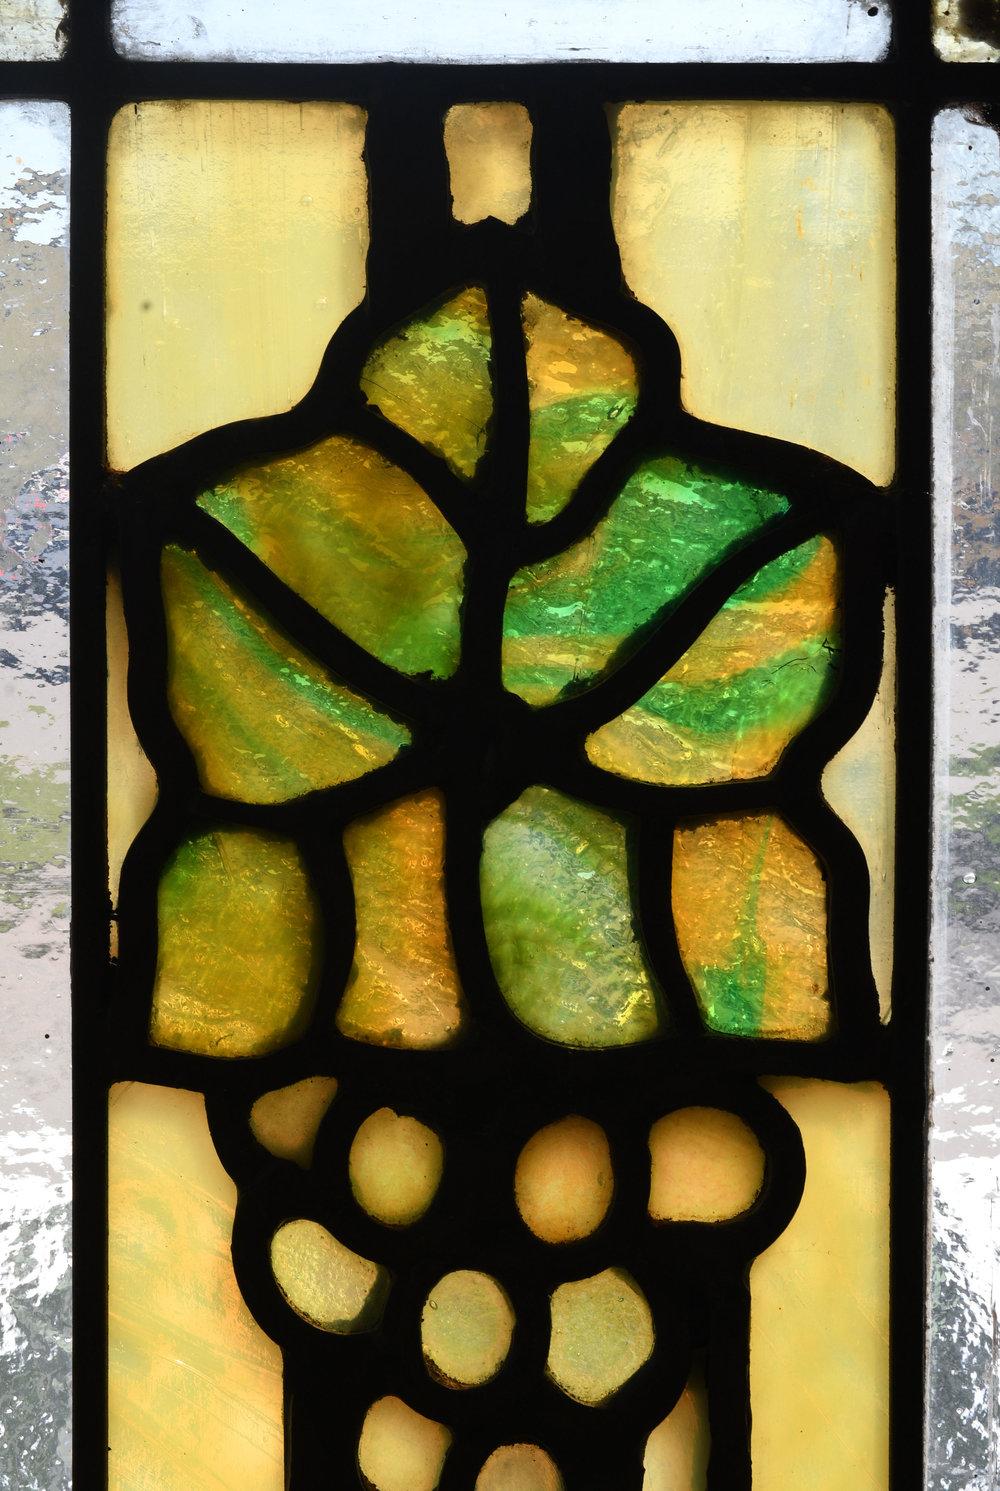 47809-bradstreet-grape-leaves-windows-closeup-backlit.jpg